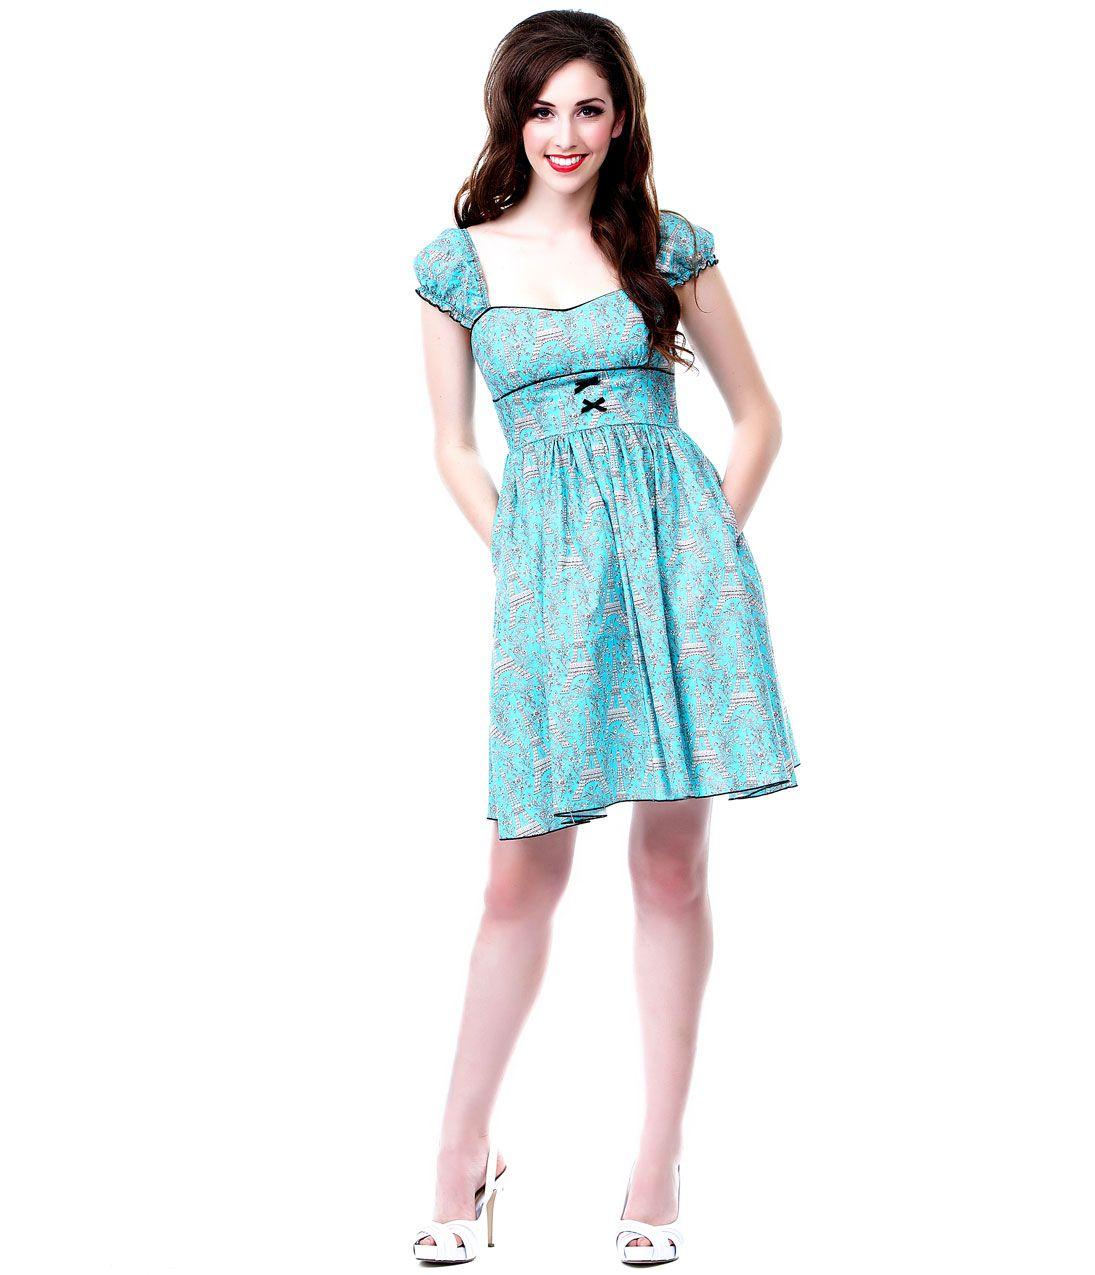 Unique Vintage | Sleeved dress, Unique vintage and Vintage prom